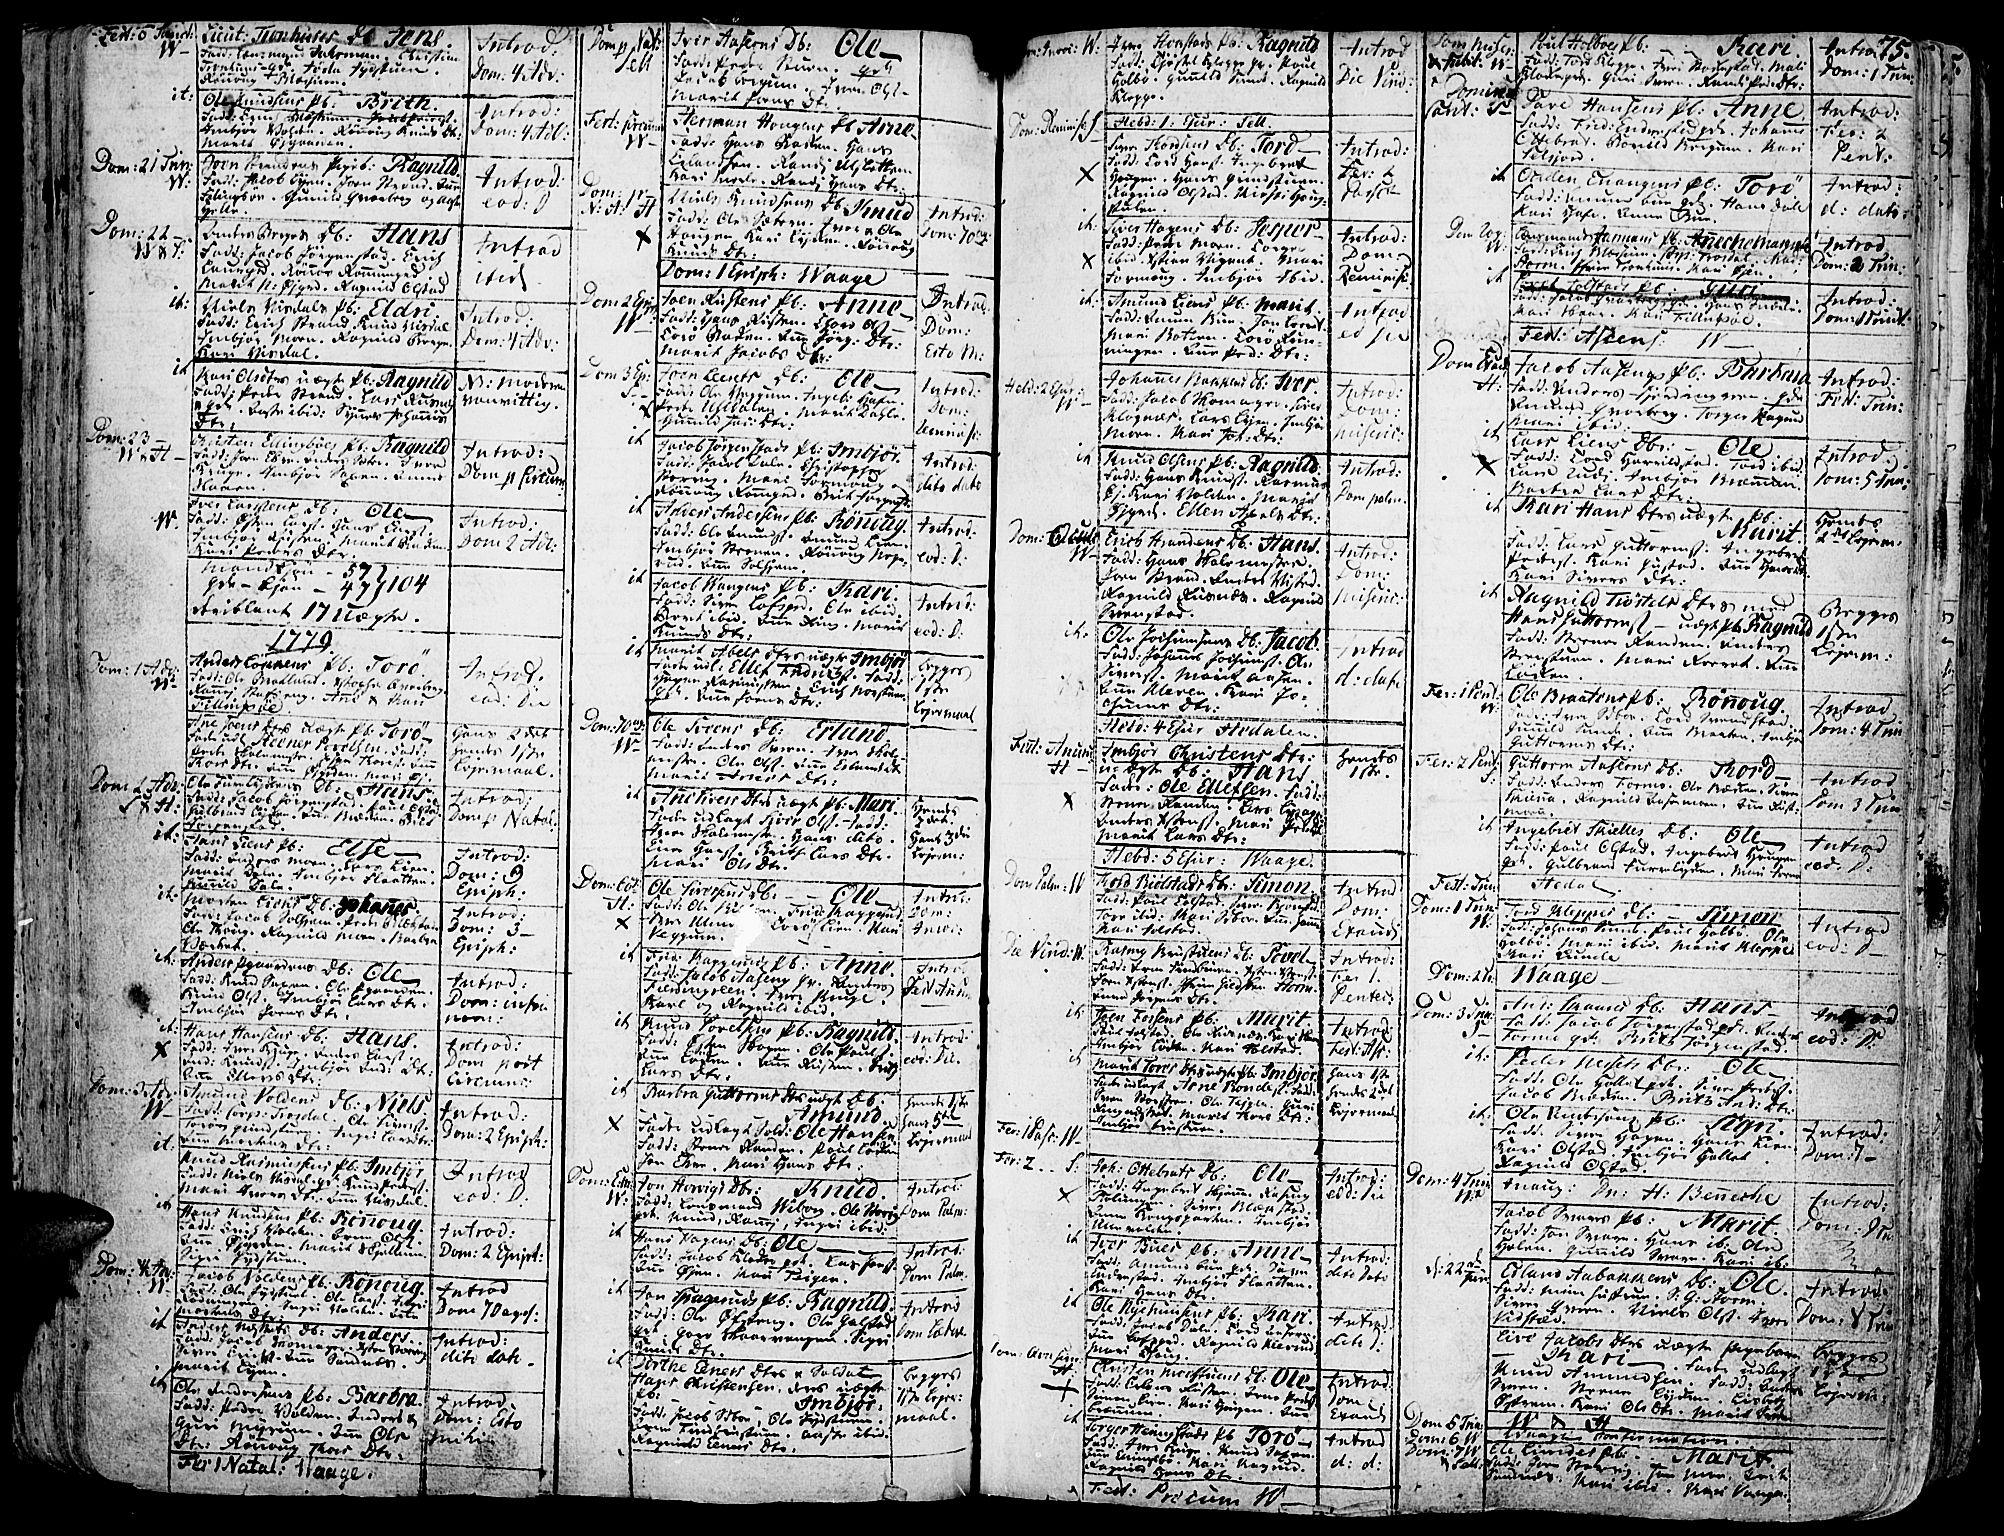 SAH, Vågå prestekontor, Ministerialbok nr. 1, 1739-1810, s. 75